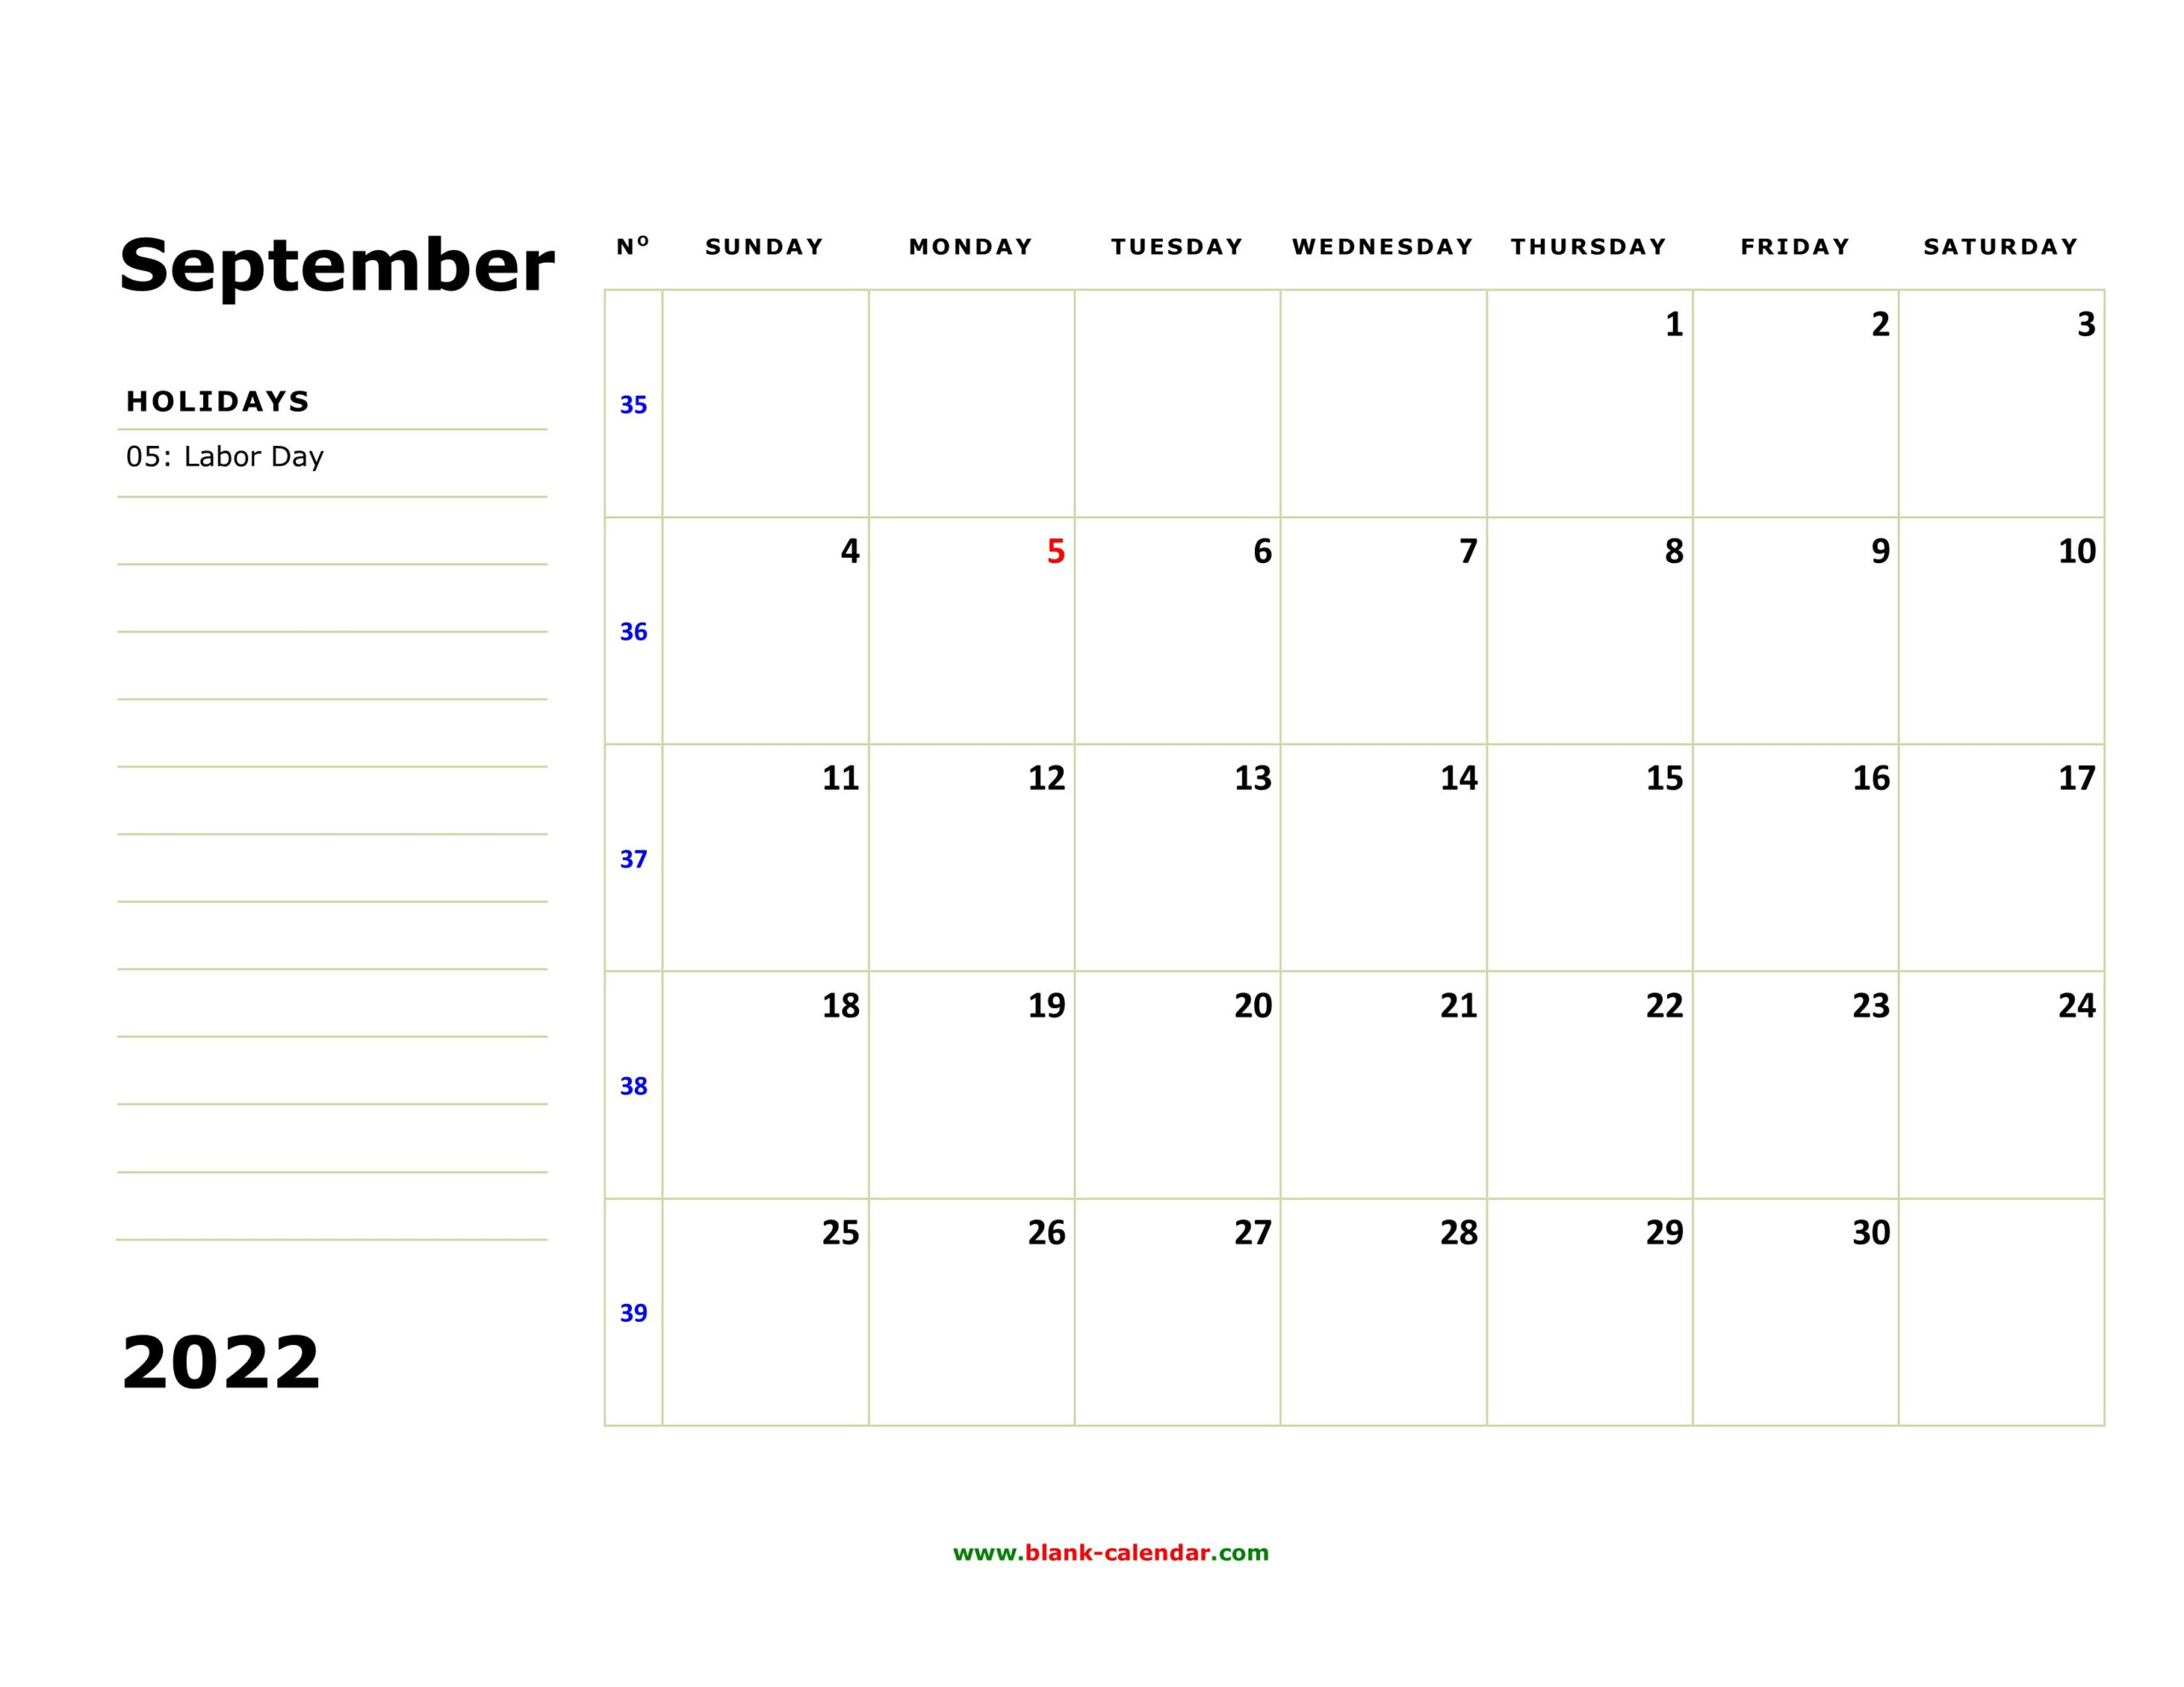 Free Download Printable September 2022 Calendar, Large Box inside September 2022 Calendar Template Photo